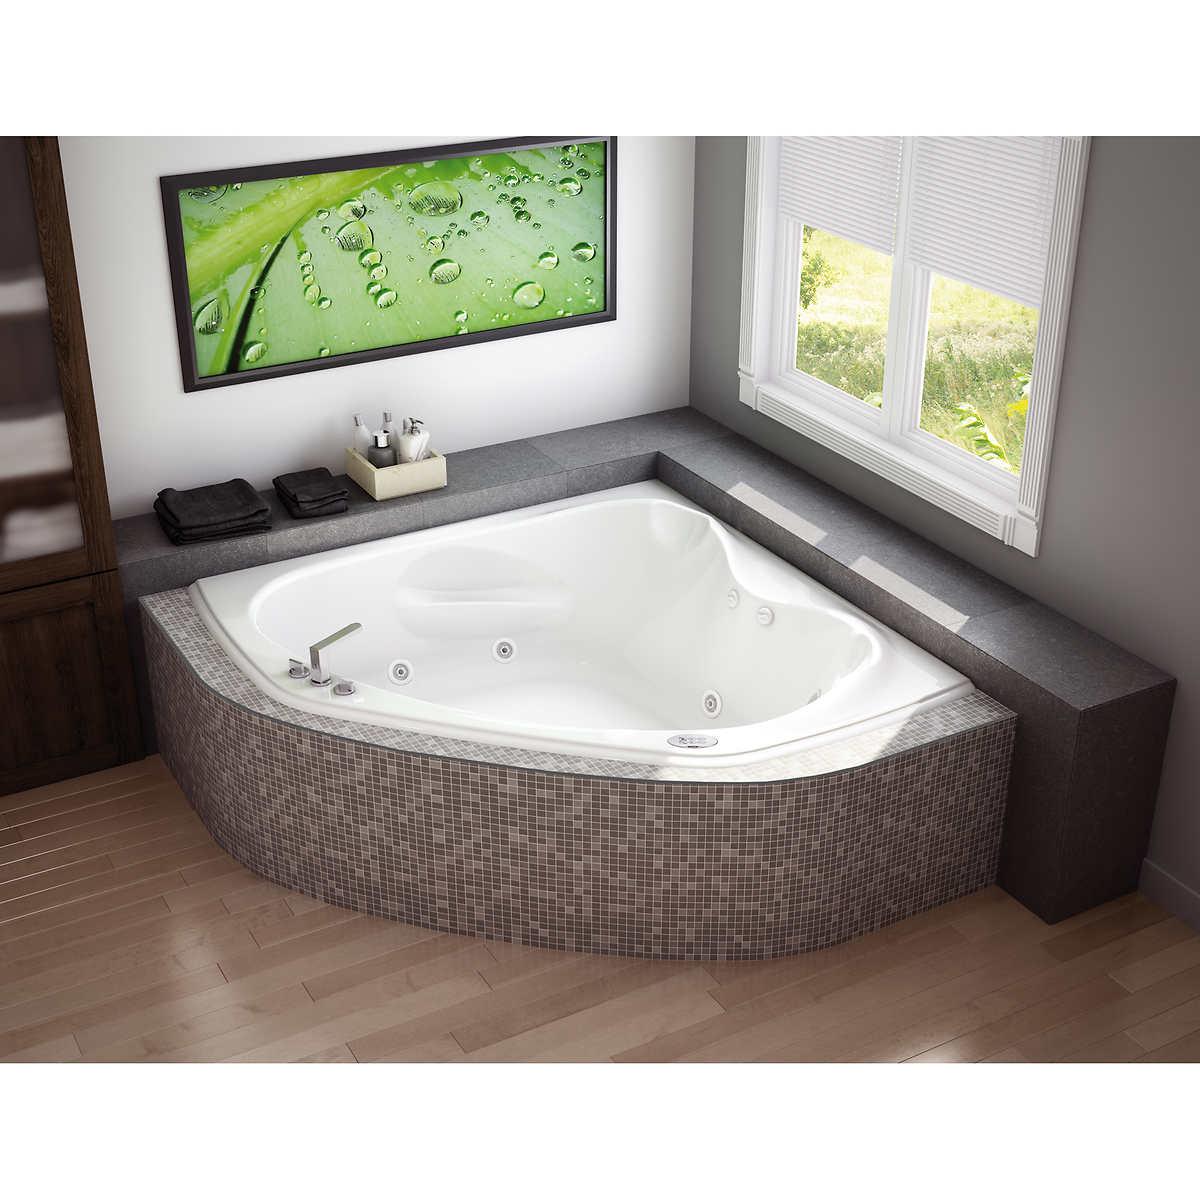 MAAX Murmur  In X  In Corner Tub - Corner tub with jets